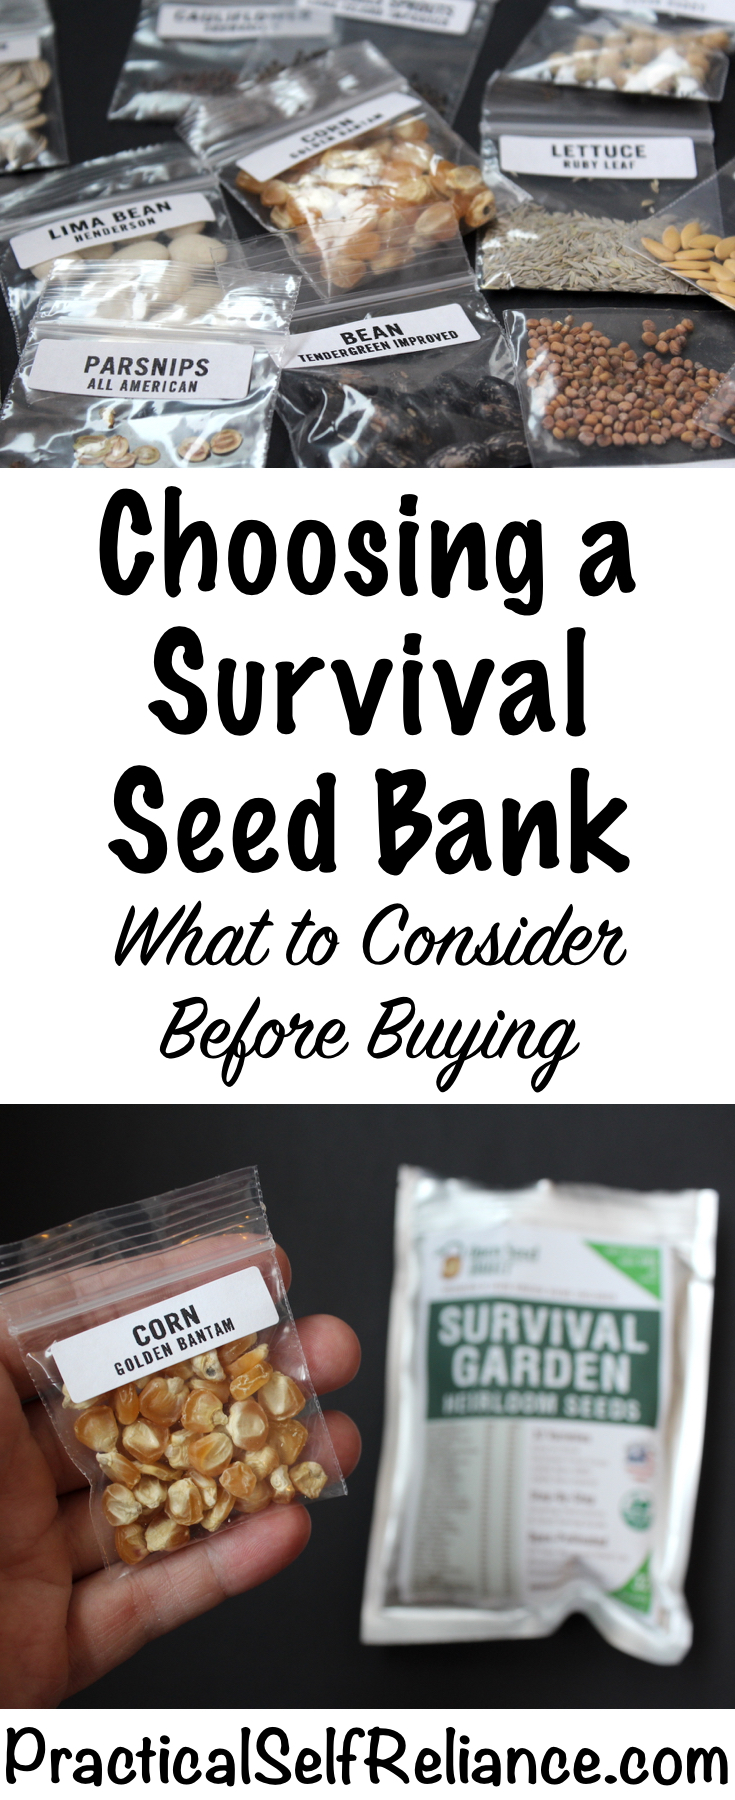 Choosing a Survival Seed Bank #seeds #vegetableseeds #seedbank #preparedness #survival #shtf #homesteading #prepper #selfsufficiency #selfreliant